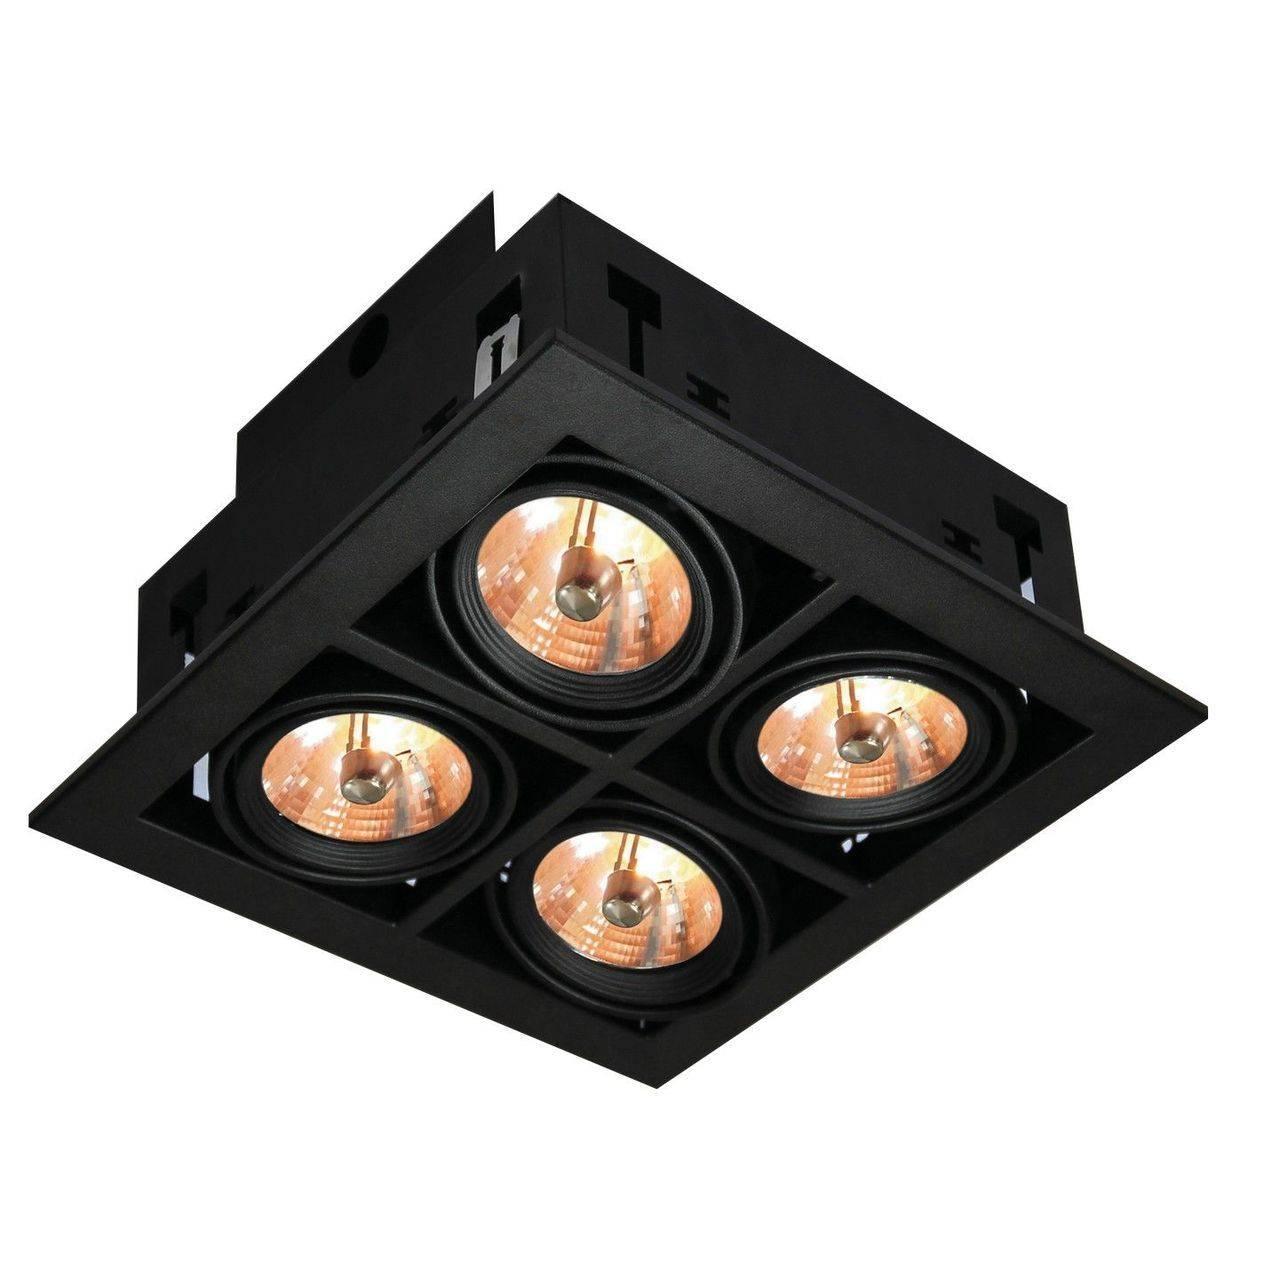 Встраиваемый светильник Arte Lamp Cardani A5930PL-4BK arte lamp a4402pl 4bk